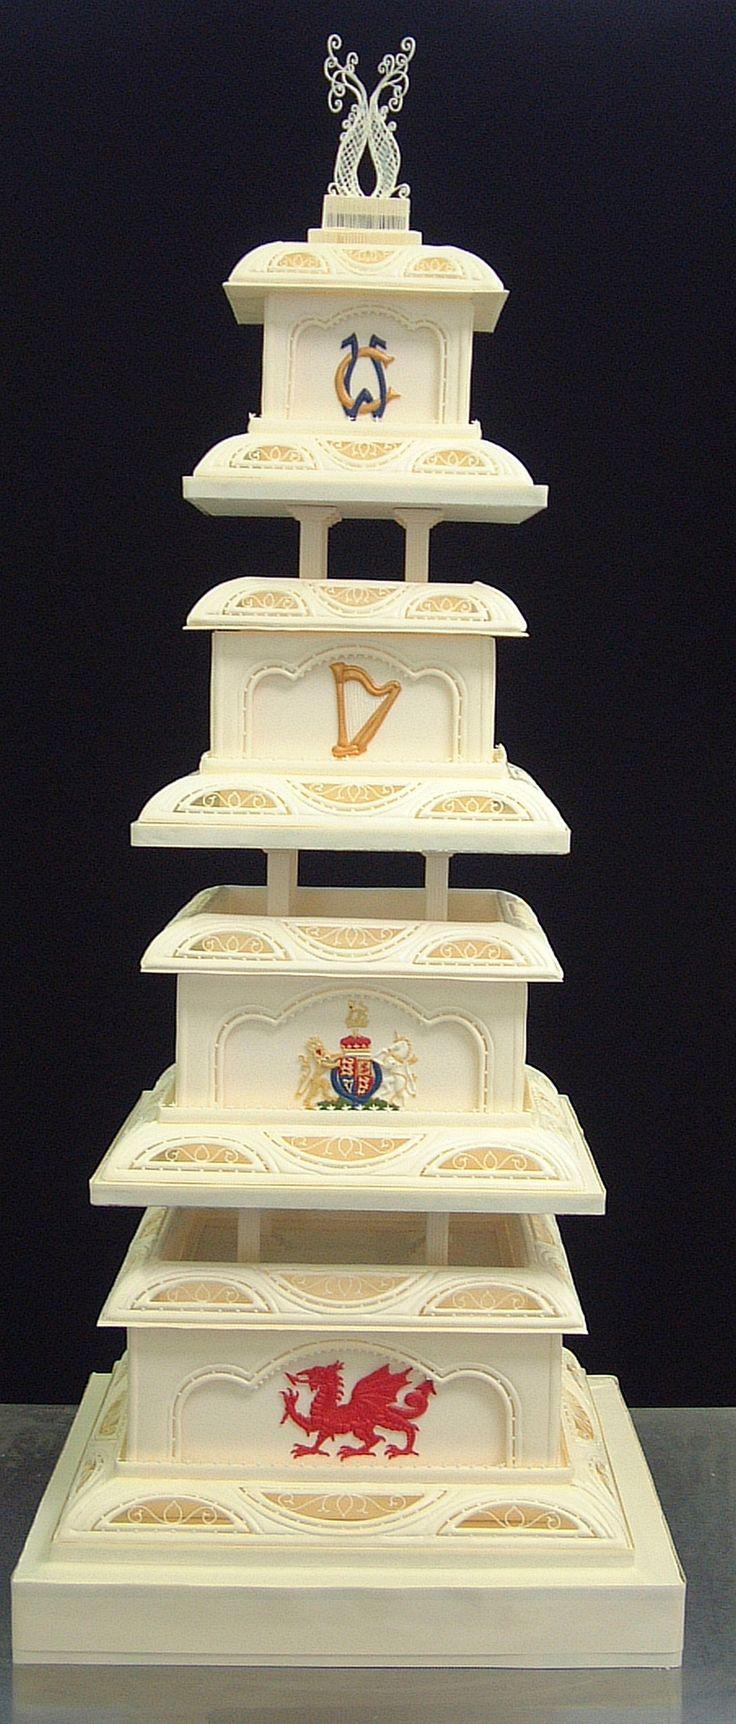 Royal Welsh Wedding cake Keywords: #weddings #jevelweddingplanning Follow Us: www.jevelweddingplanning.com  www.facebook.com/jevelweddingplanning/